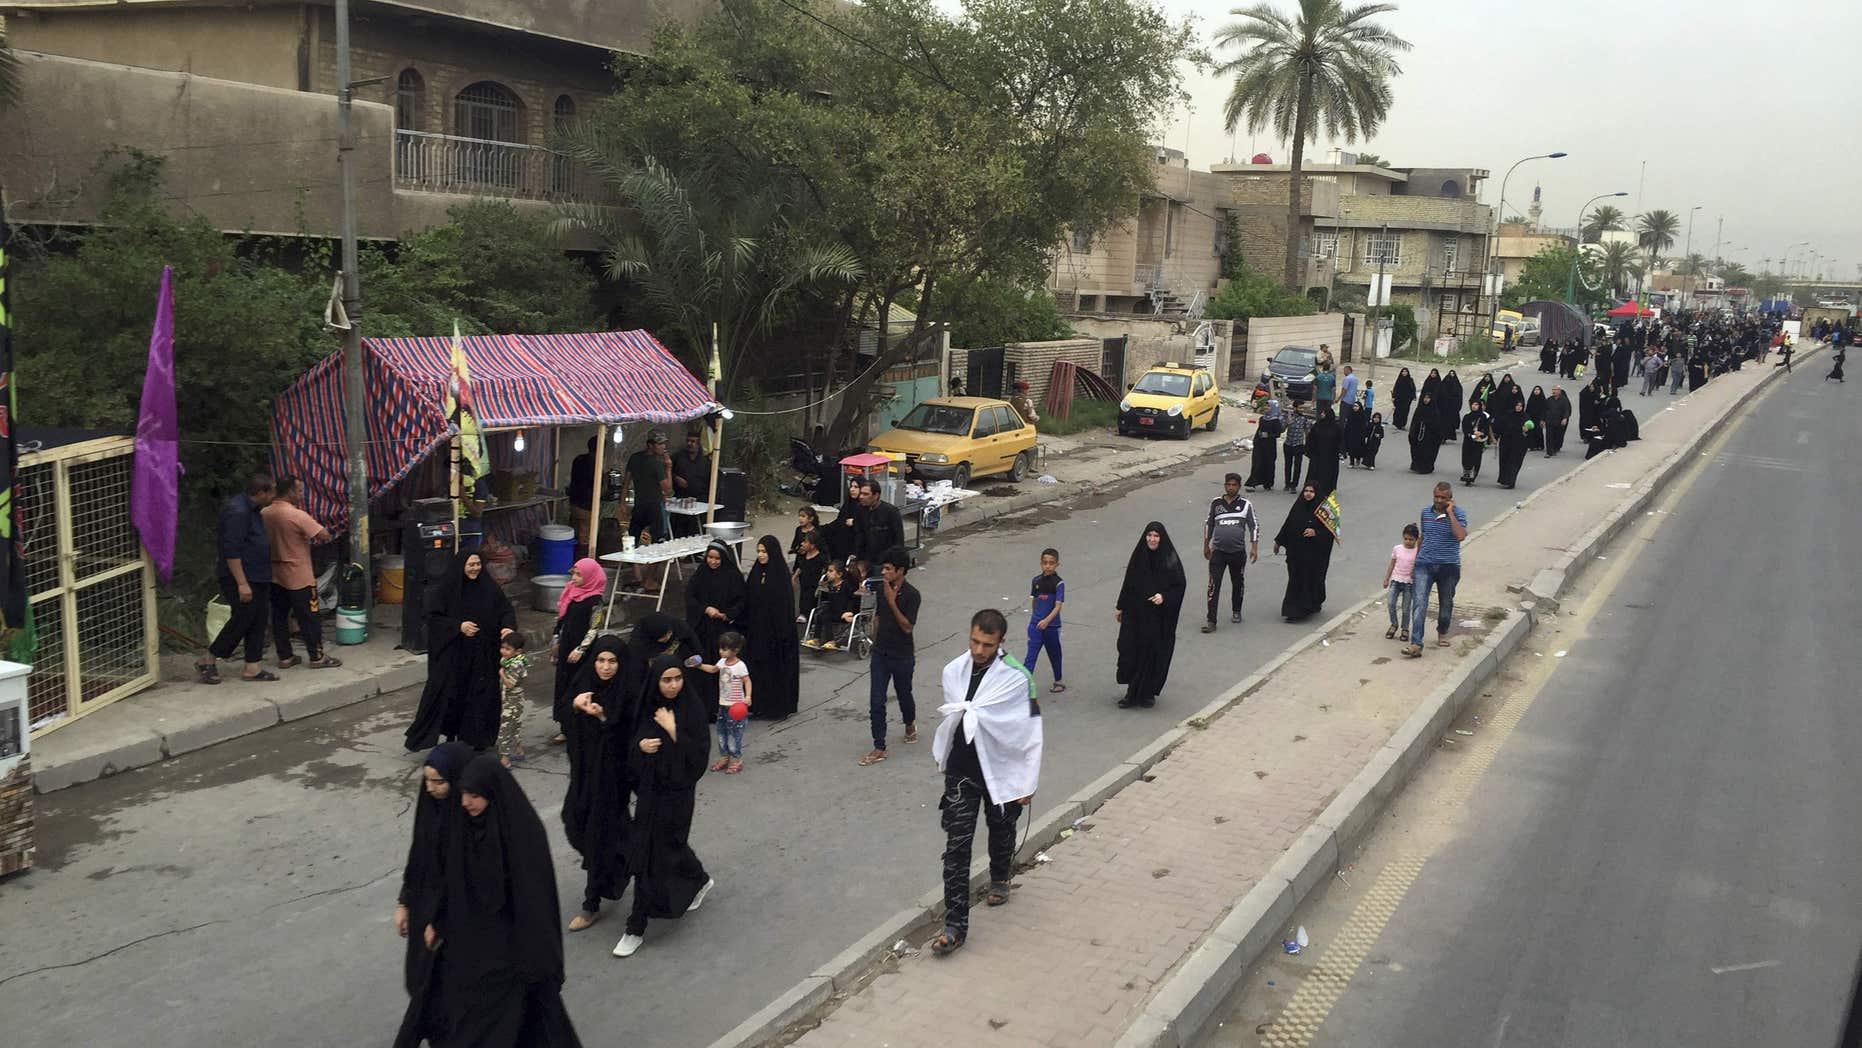 April 29, 2016: Shiite pilgrims march toward the Imam Mousa al-Kadhim shrine to commemorate the anniversary of the Imam's death in Baghdad, Iraq.